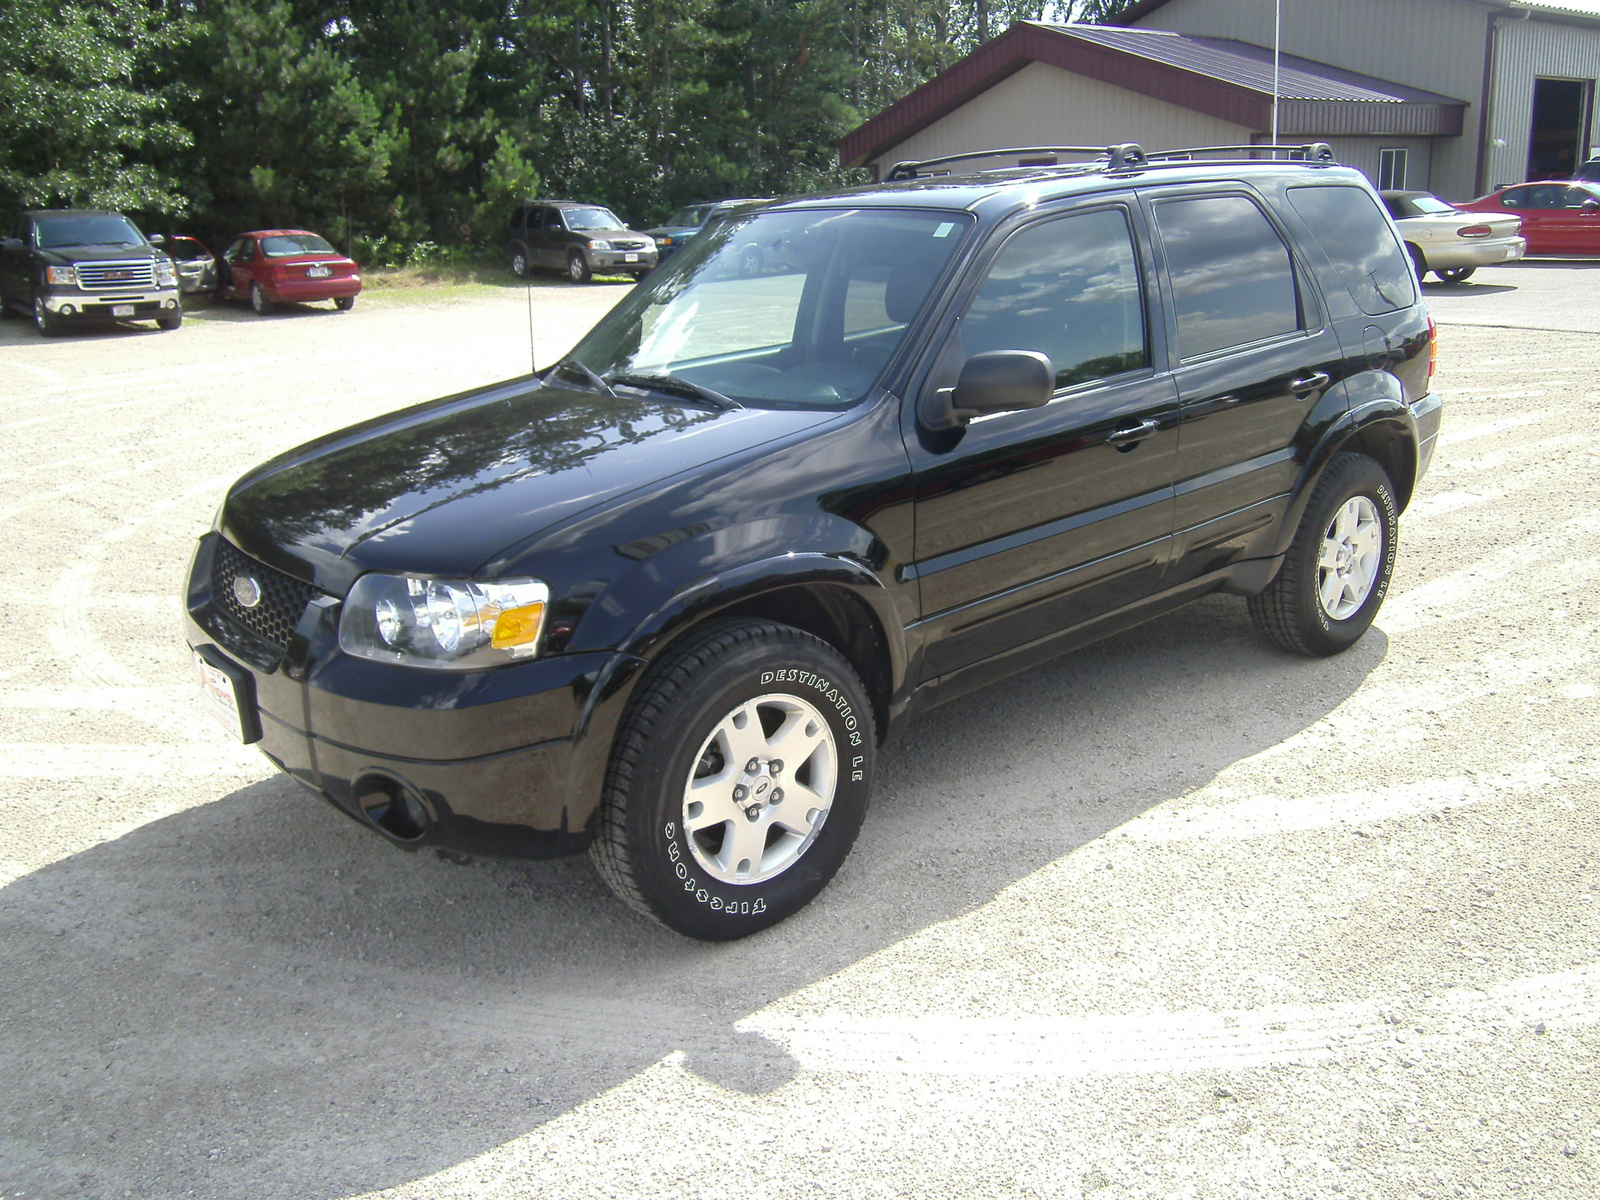 2006 Ford Escape Pictures Cargurus